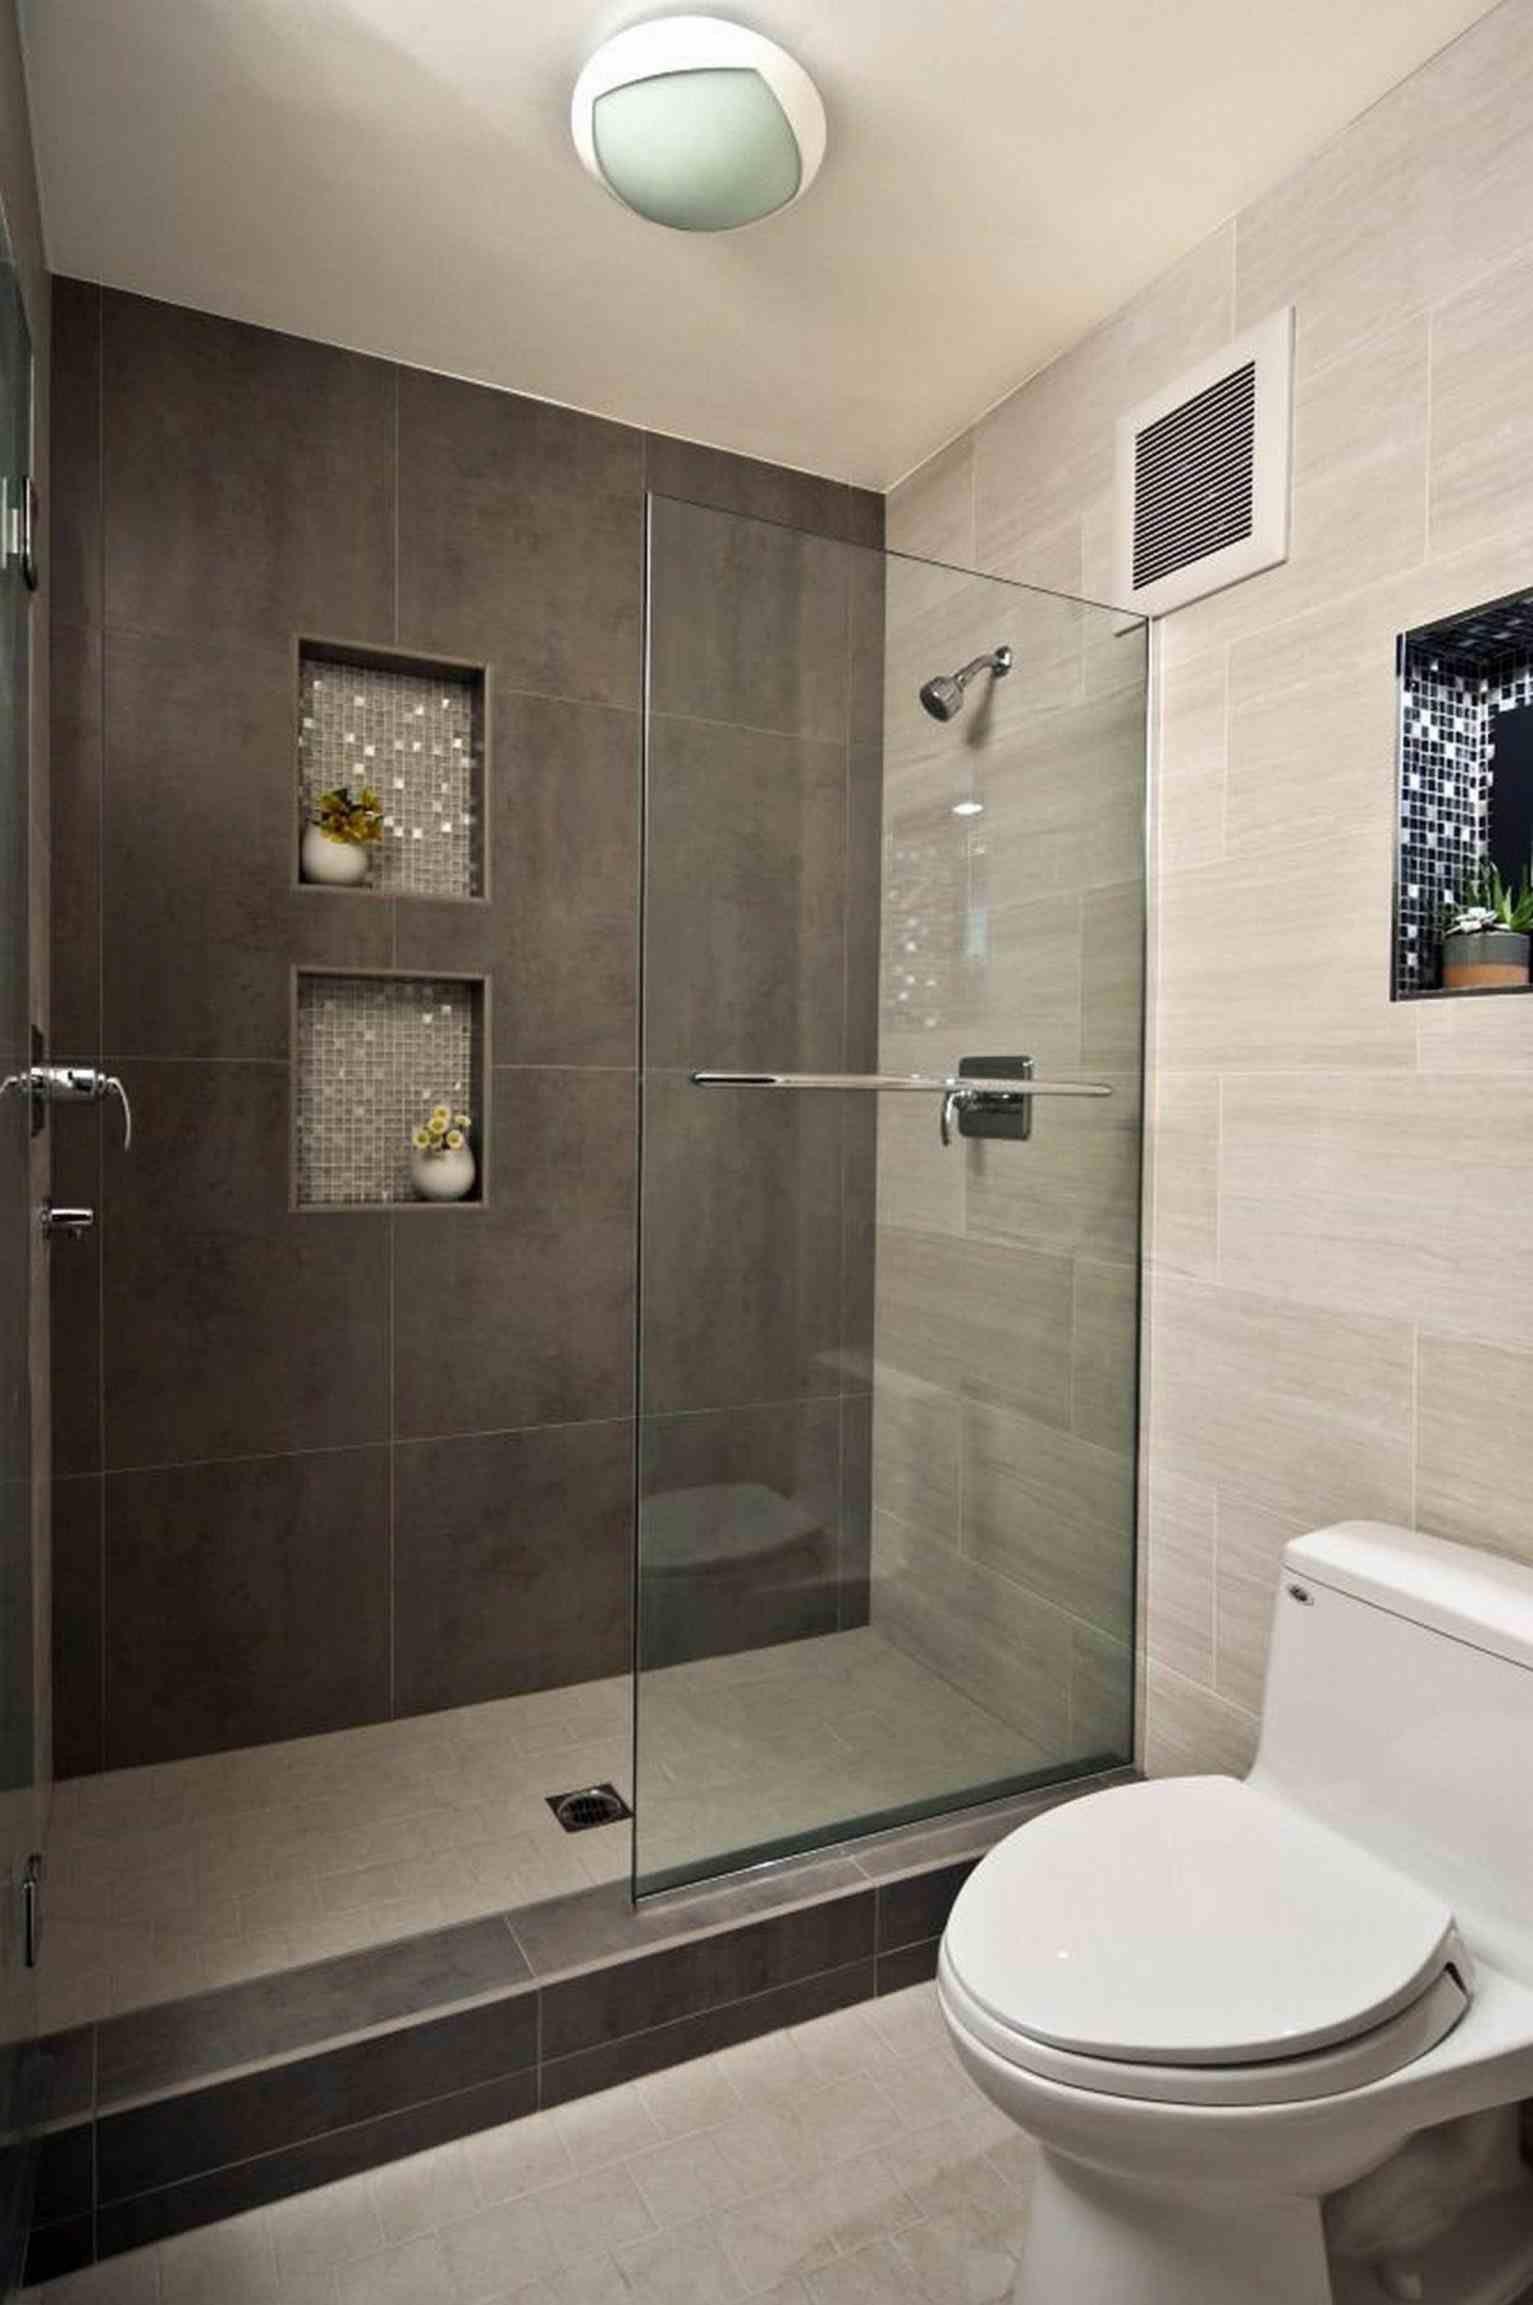 New Post Small Bathroom Designs With Walk In Shower Visit Bobayule Trending Decors Bathroom Design Small Bathrooms Remodel Small Bathroom